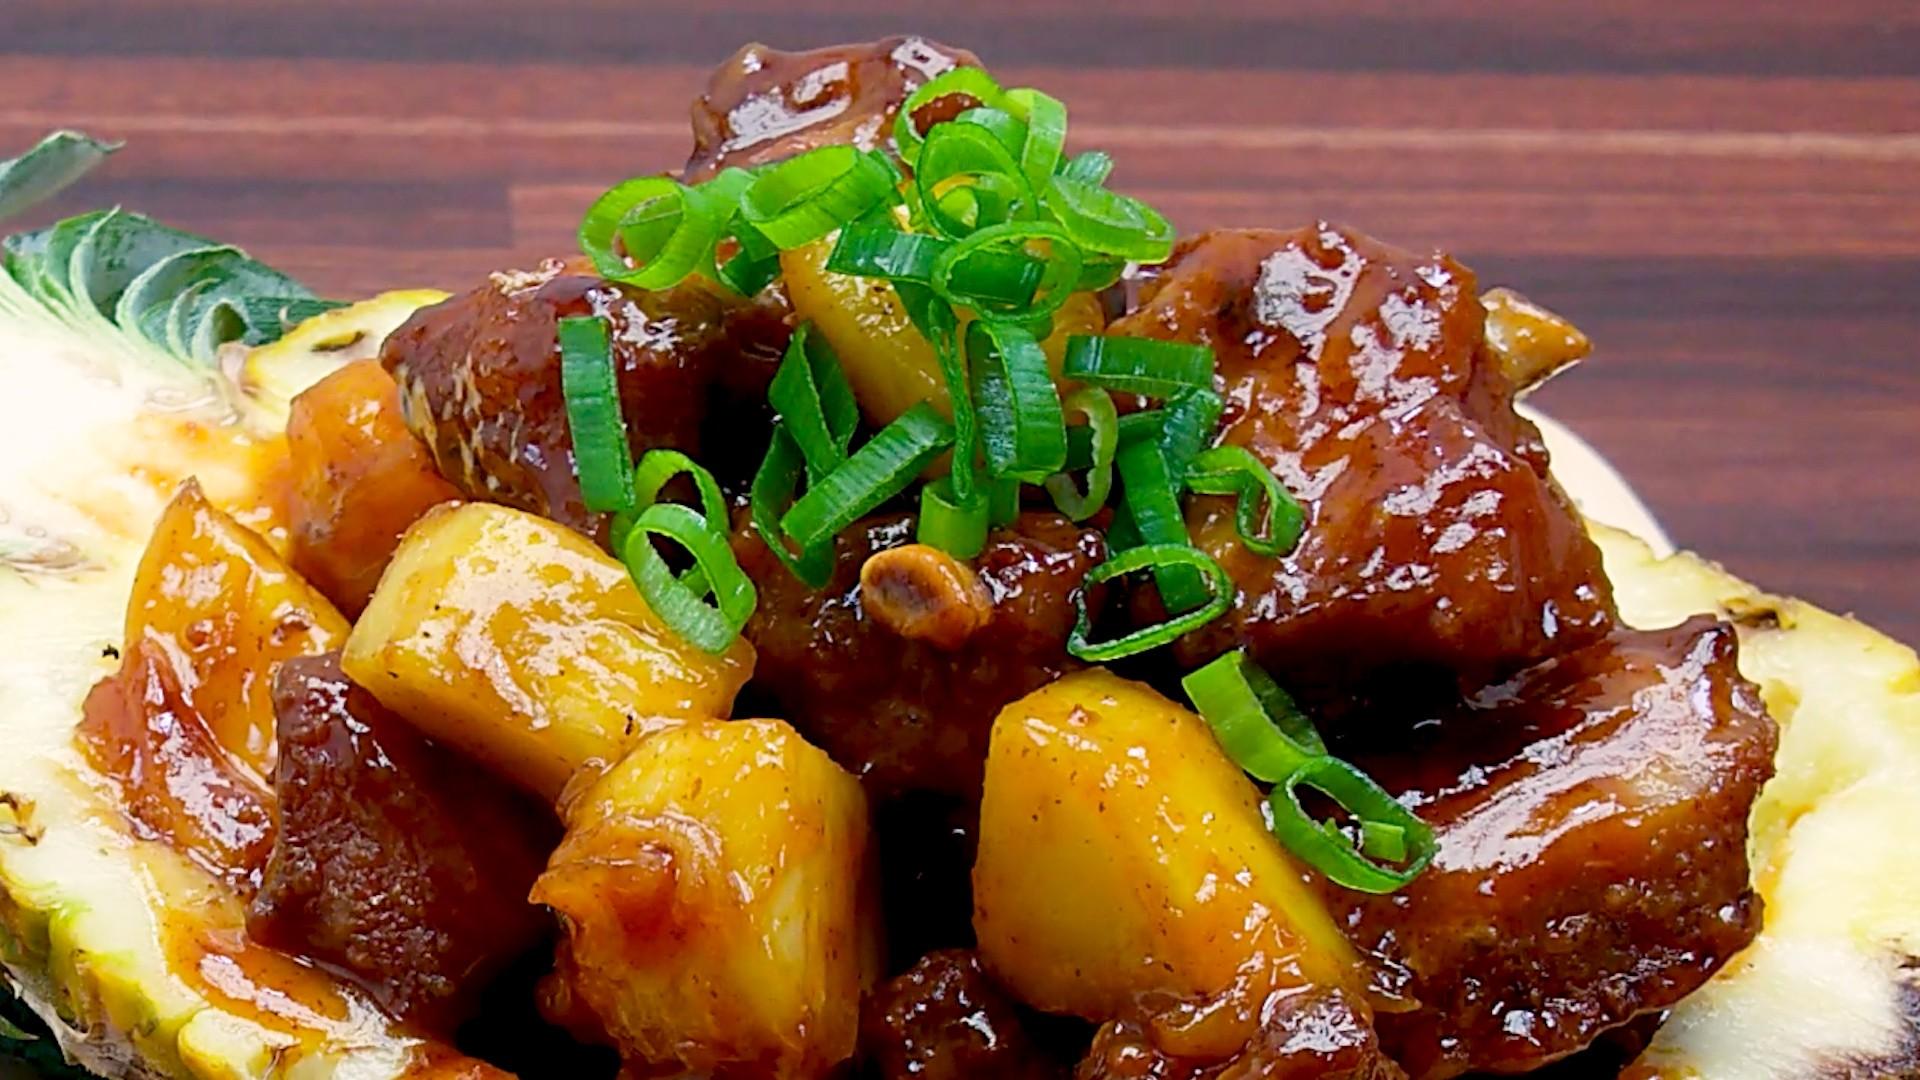 Pineapple Meaty Pork Ribs Pic7